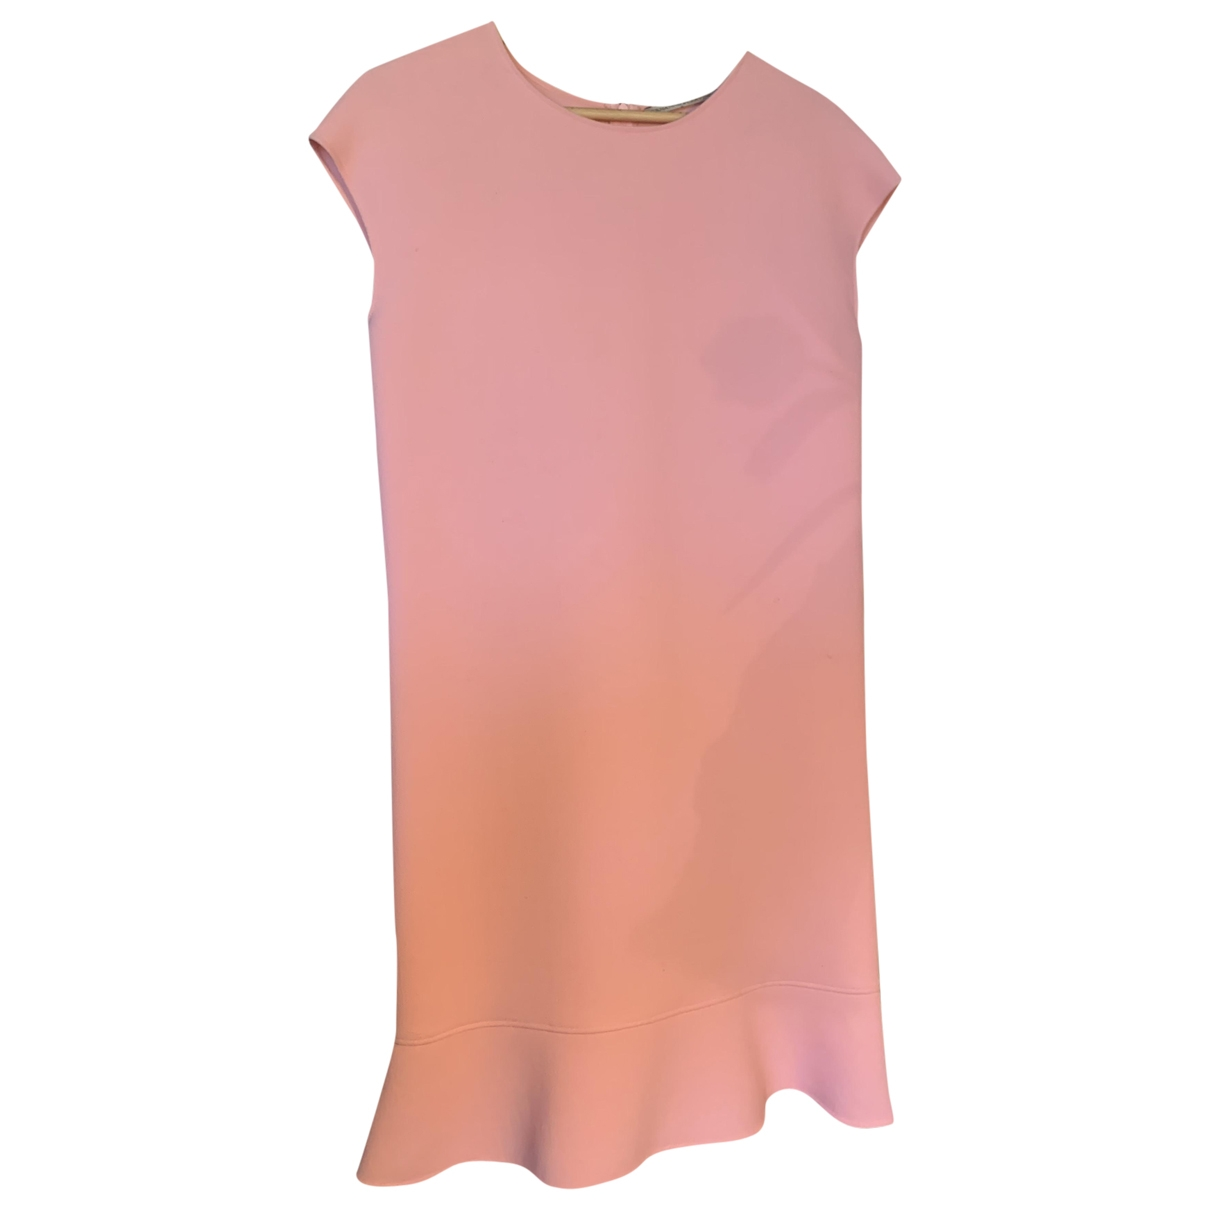 Ermanno Scervino \N Pink Wool dress for Women 38 IT